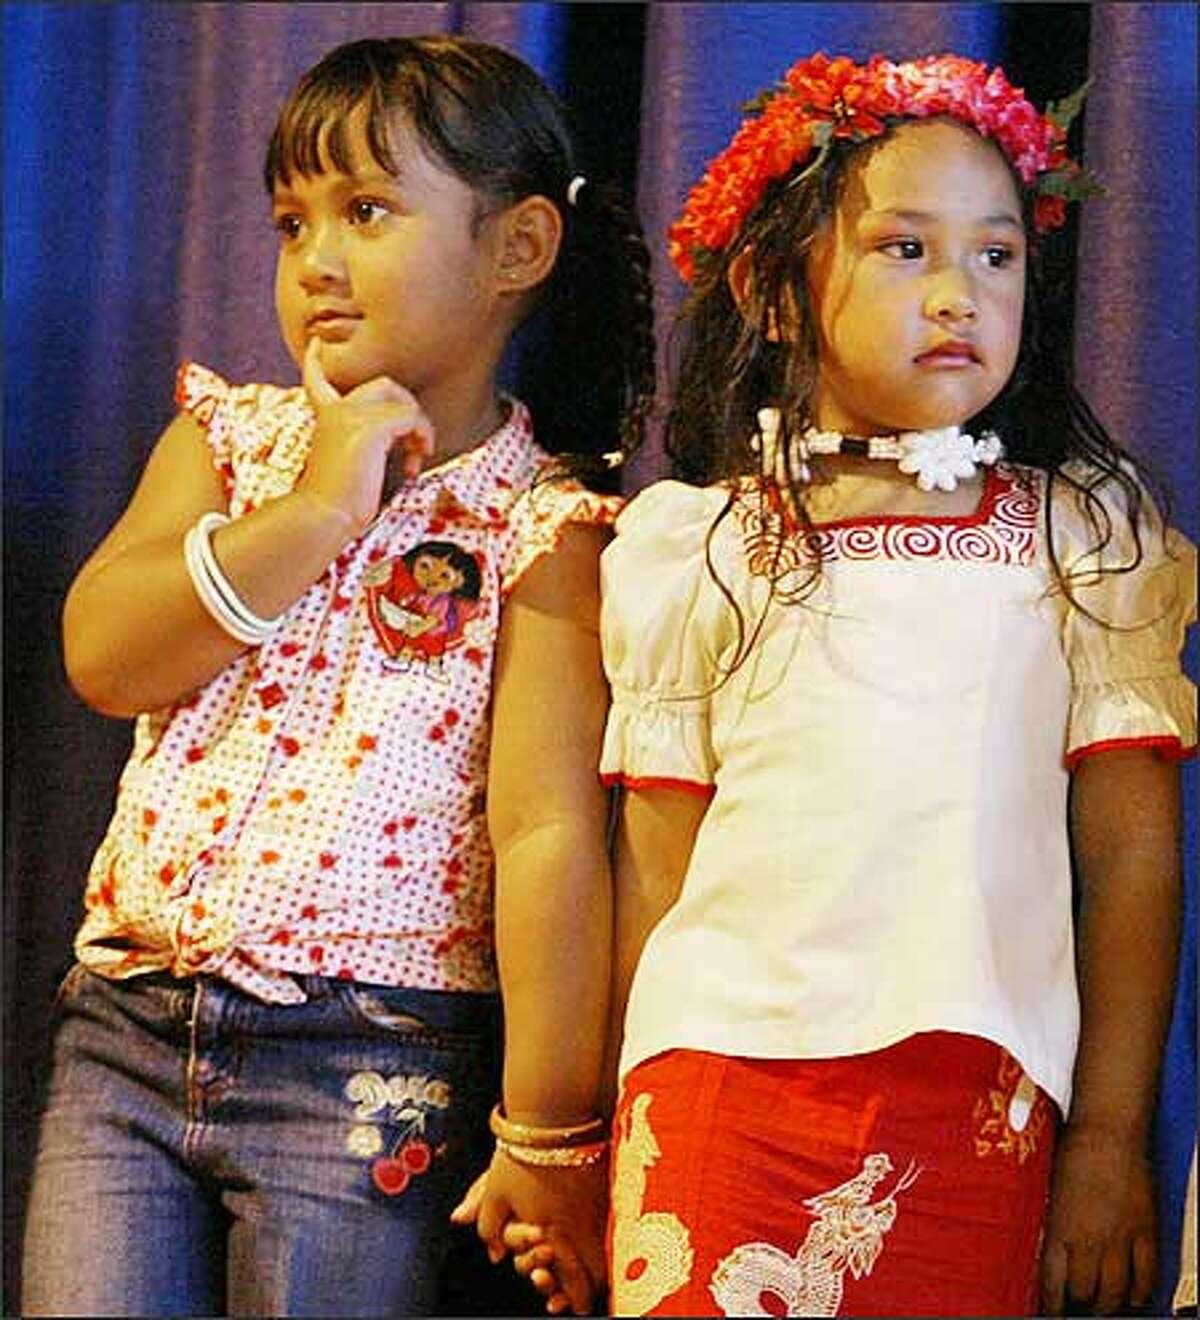 Letavia Laga, 5, left, and Merina Sanchez, 4, stand on stage at the Pasefika School Readiness program's